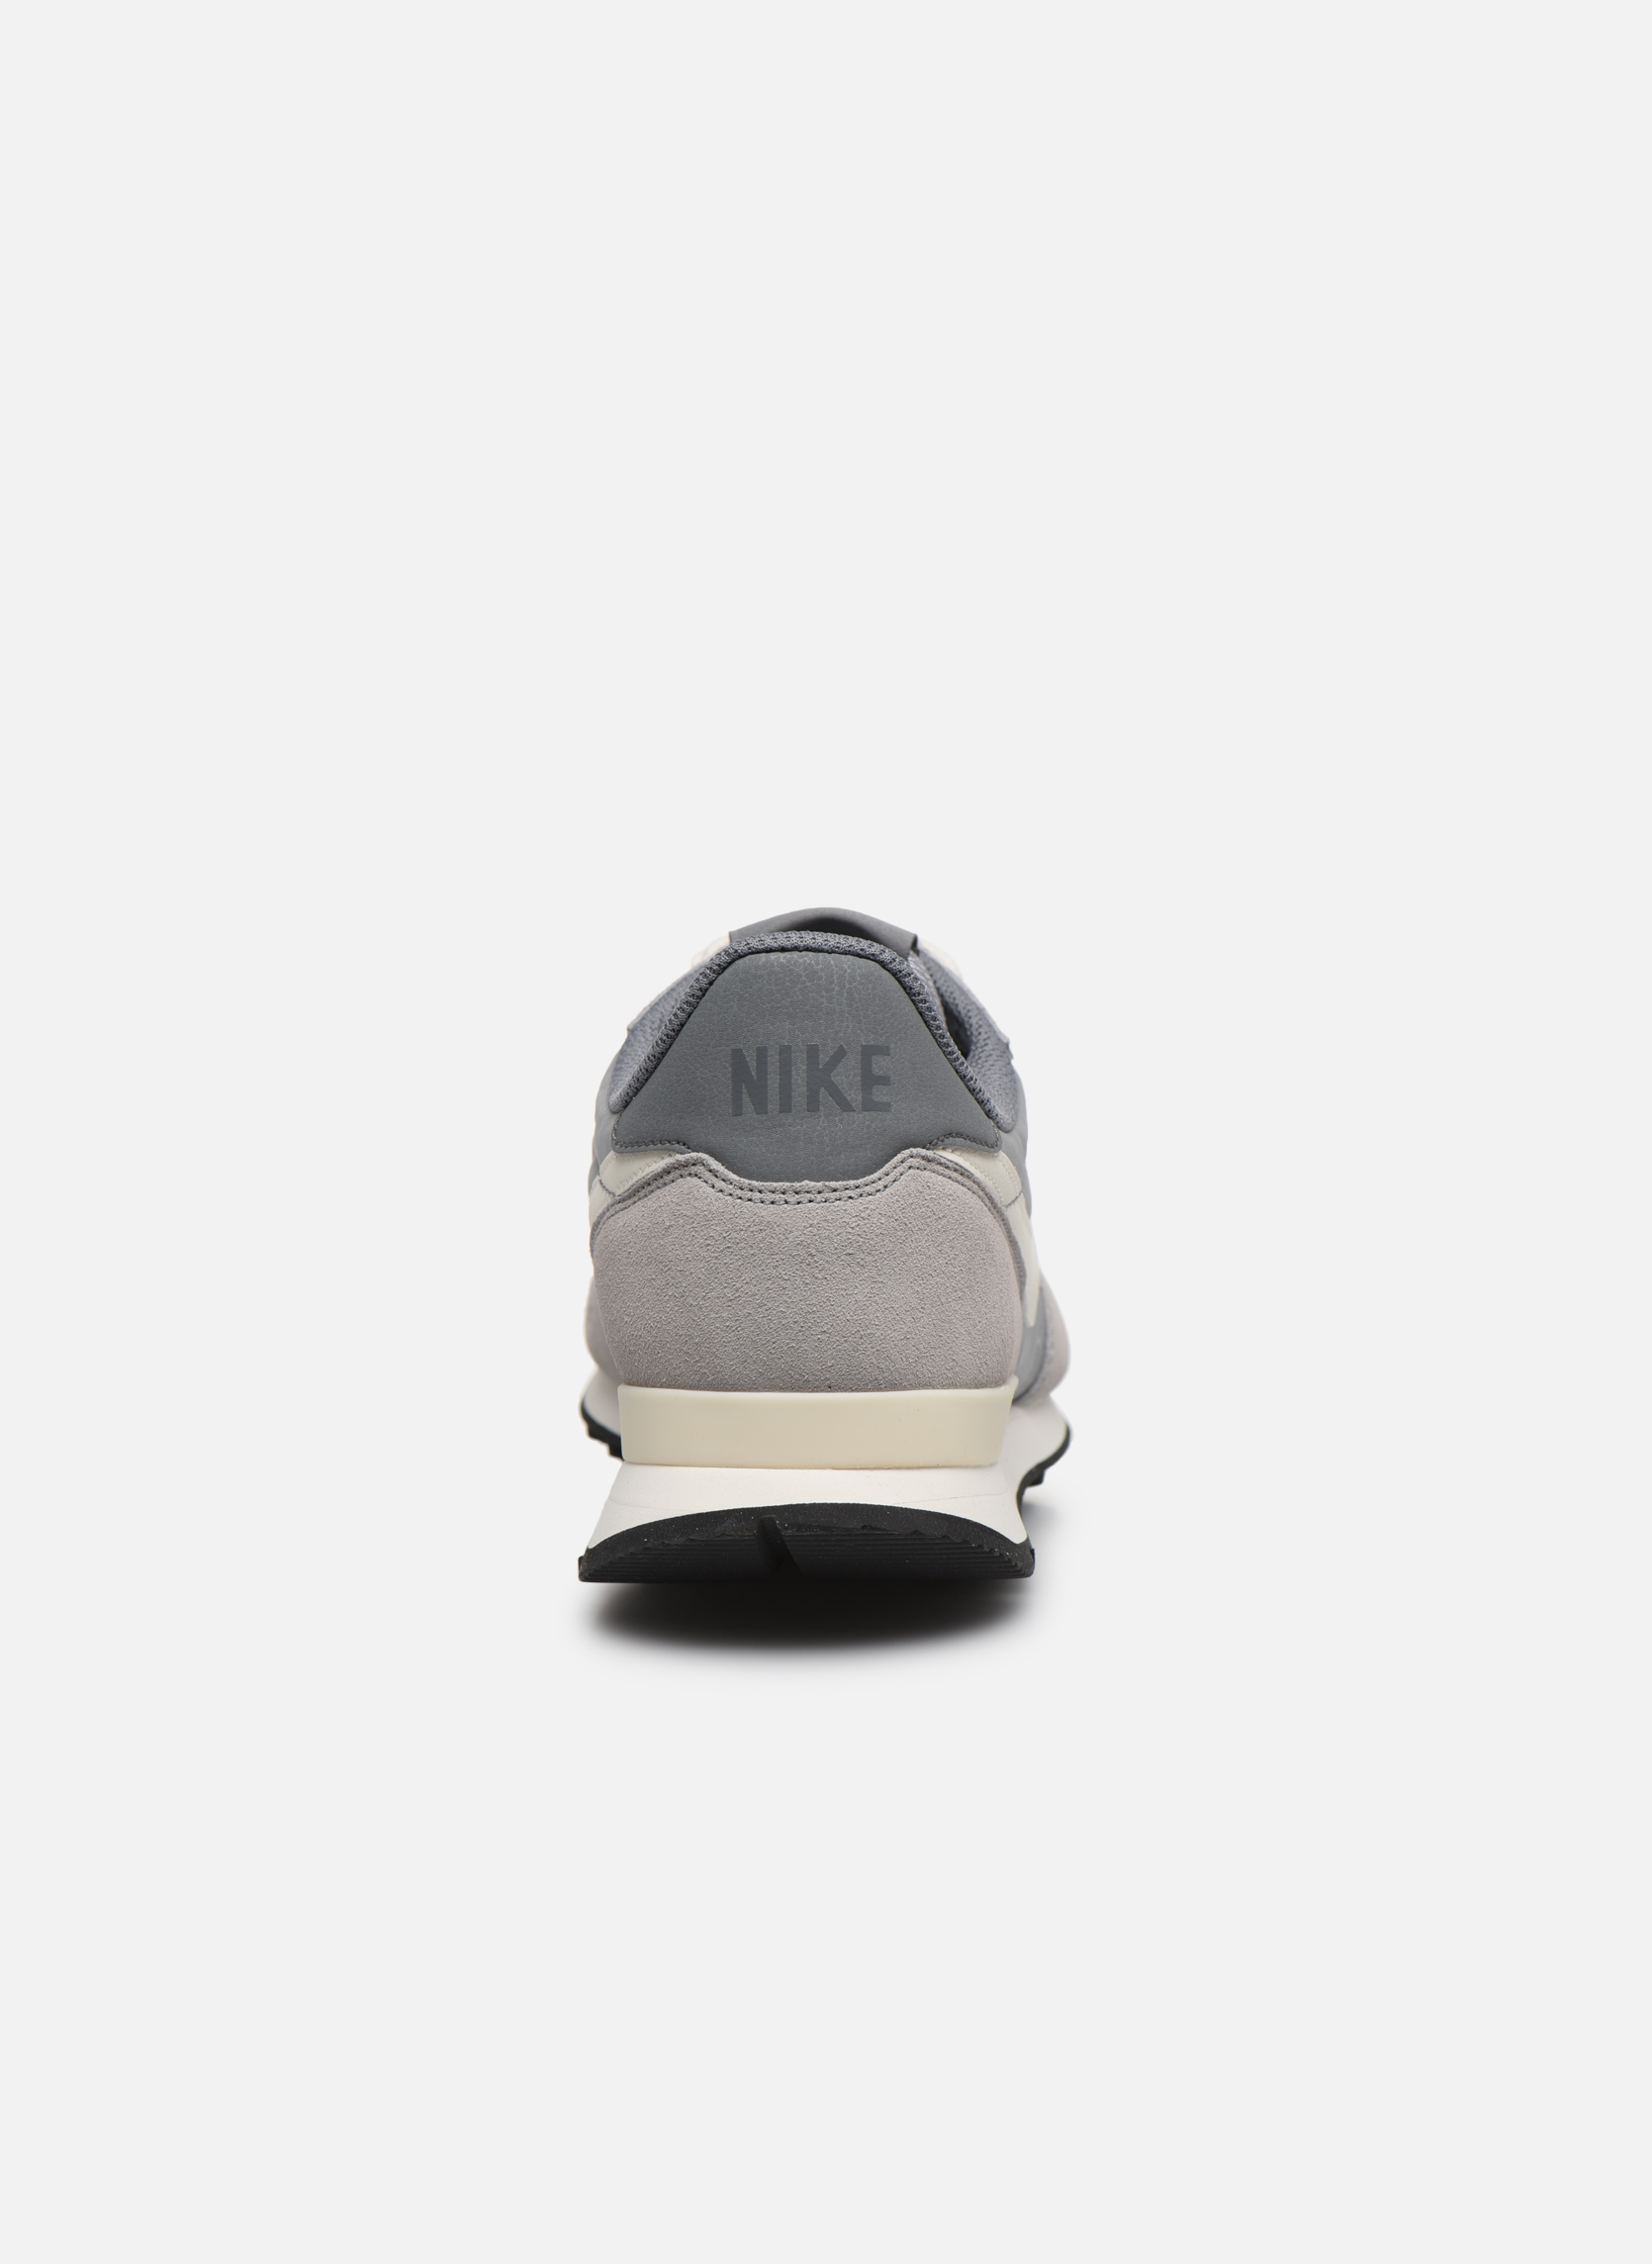 Nike Air Odyssey Pr Pltnm/Cl Gry-Smmt Wht-Wht